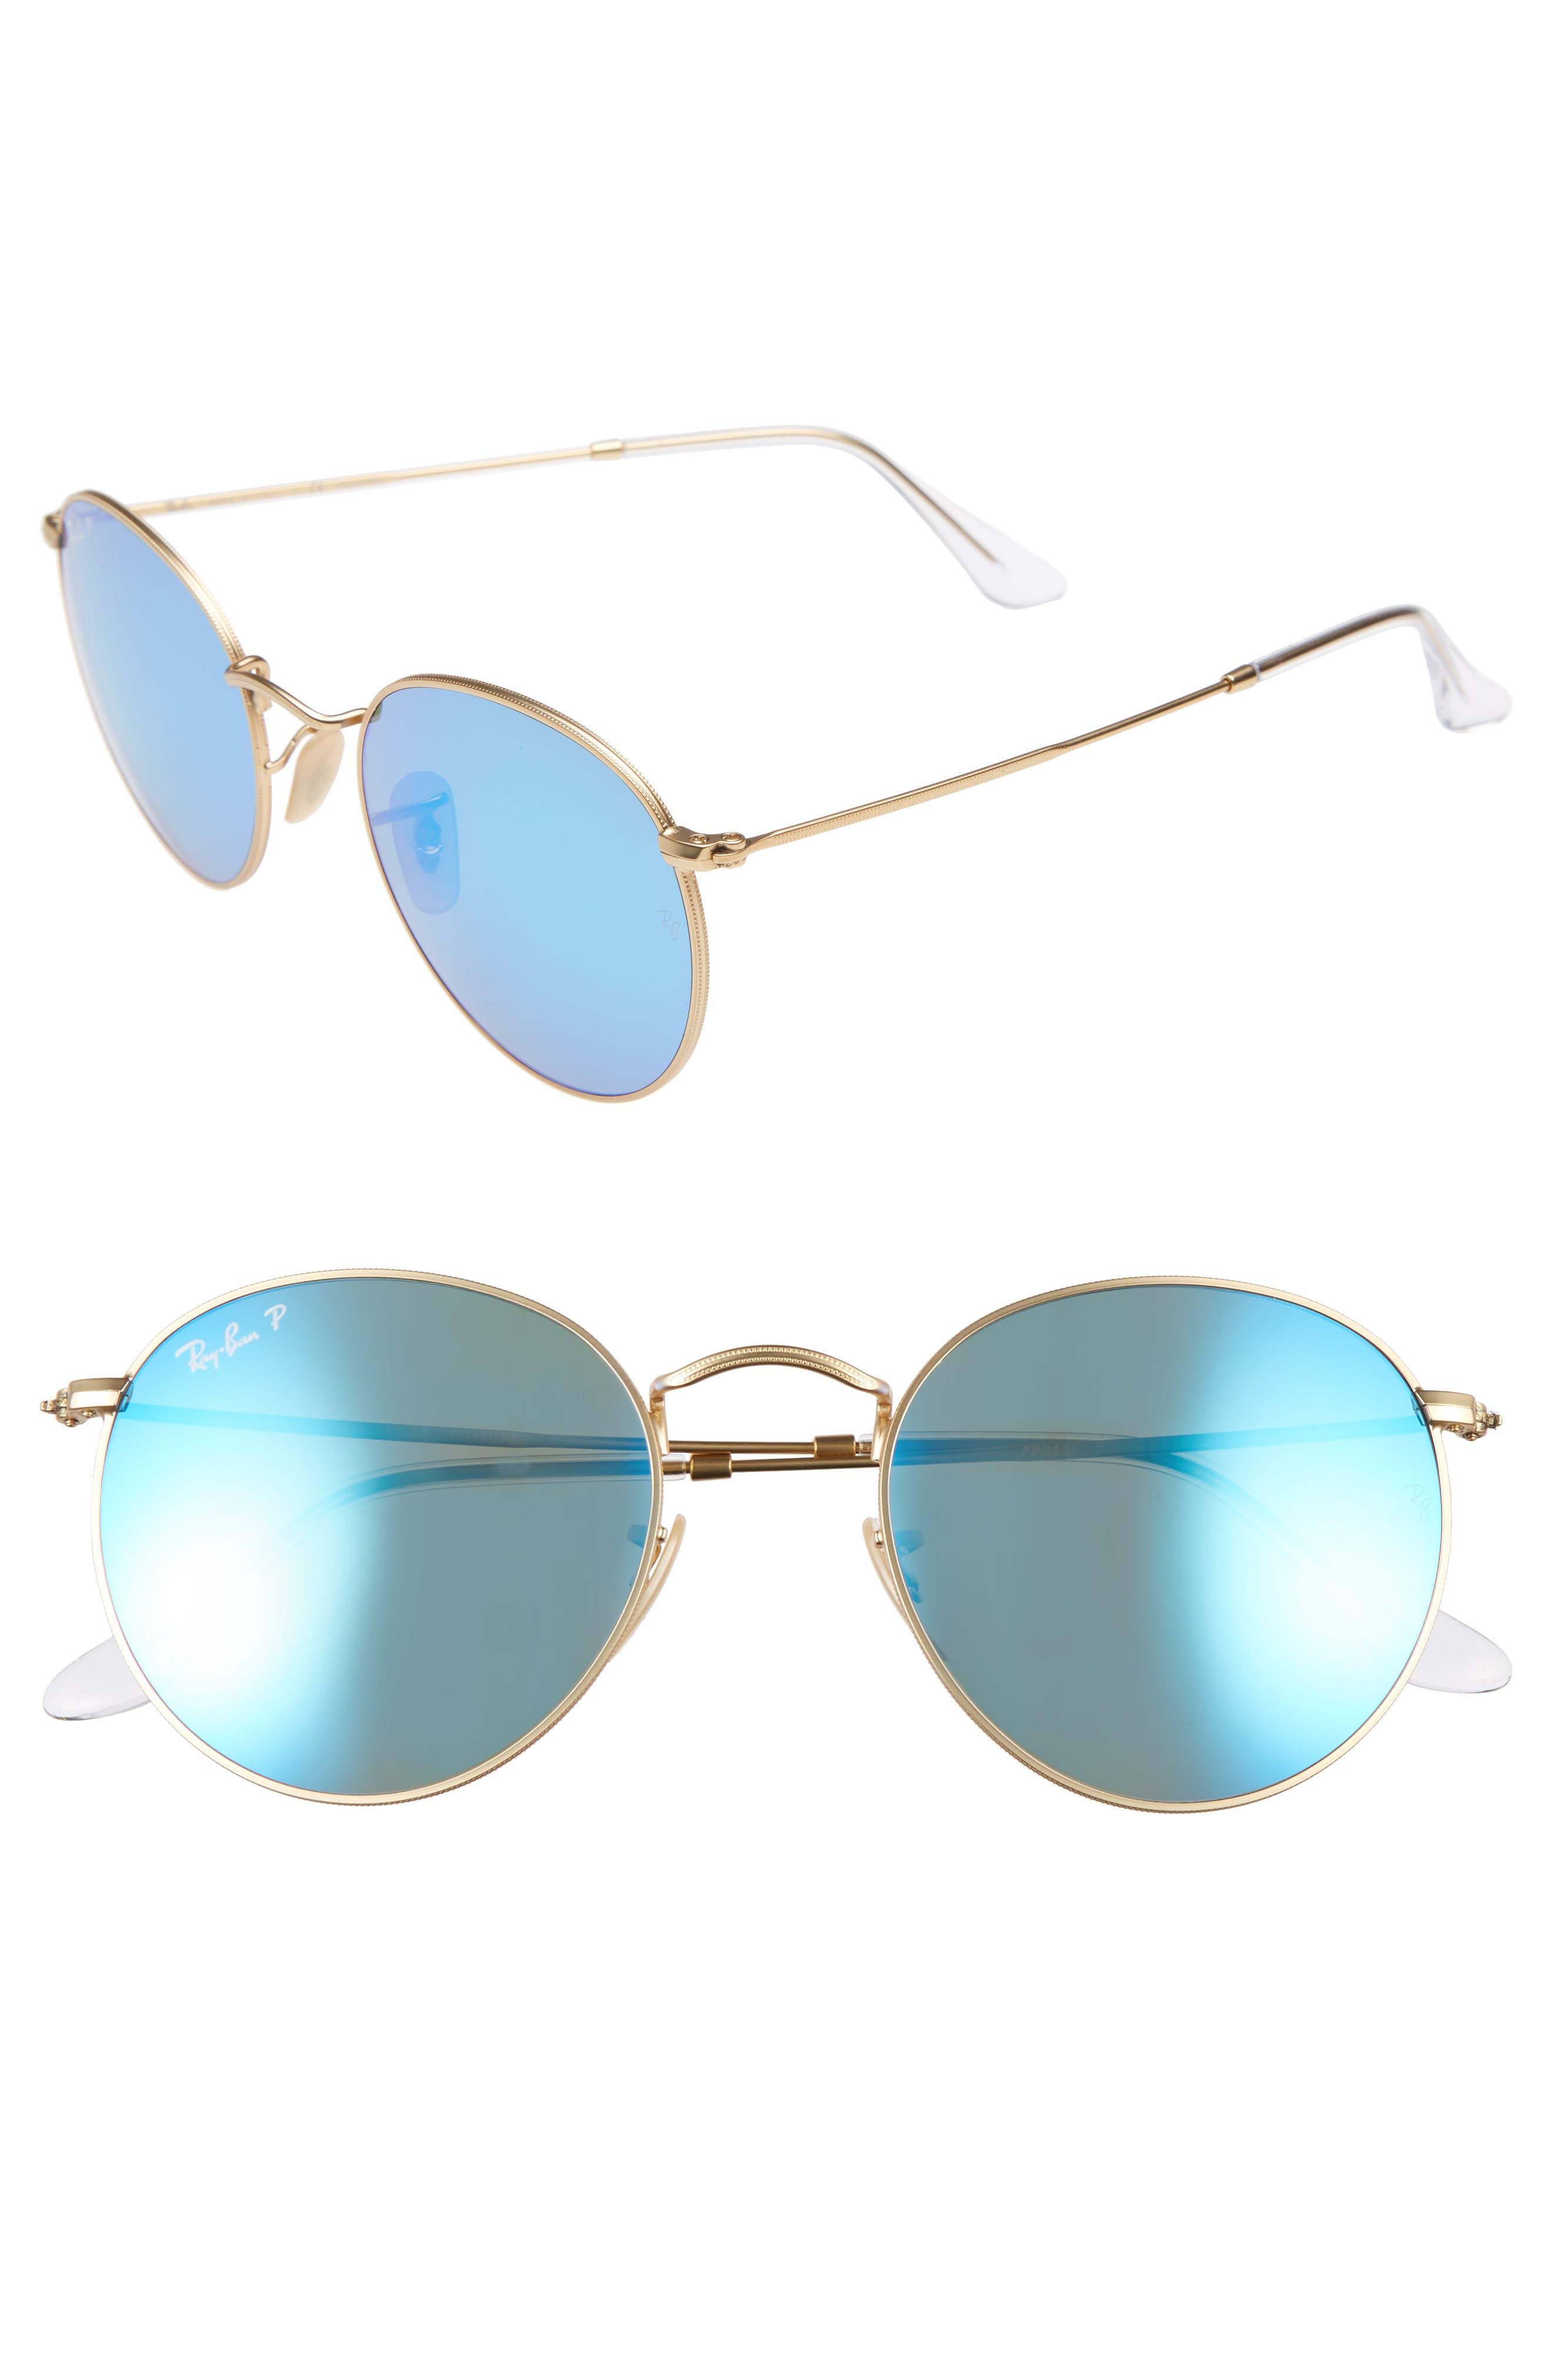 Main Image - Ray-Ban 53mm Polarized Round Retro Sunglasses